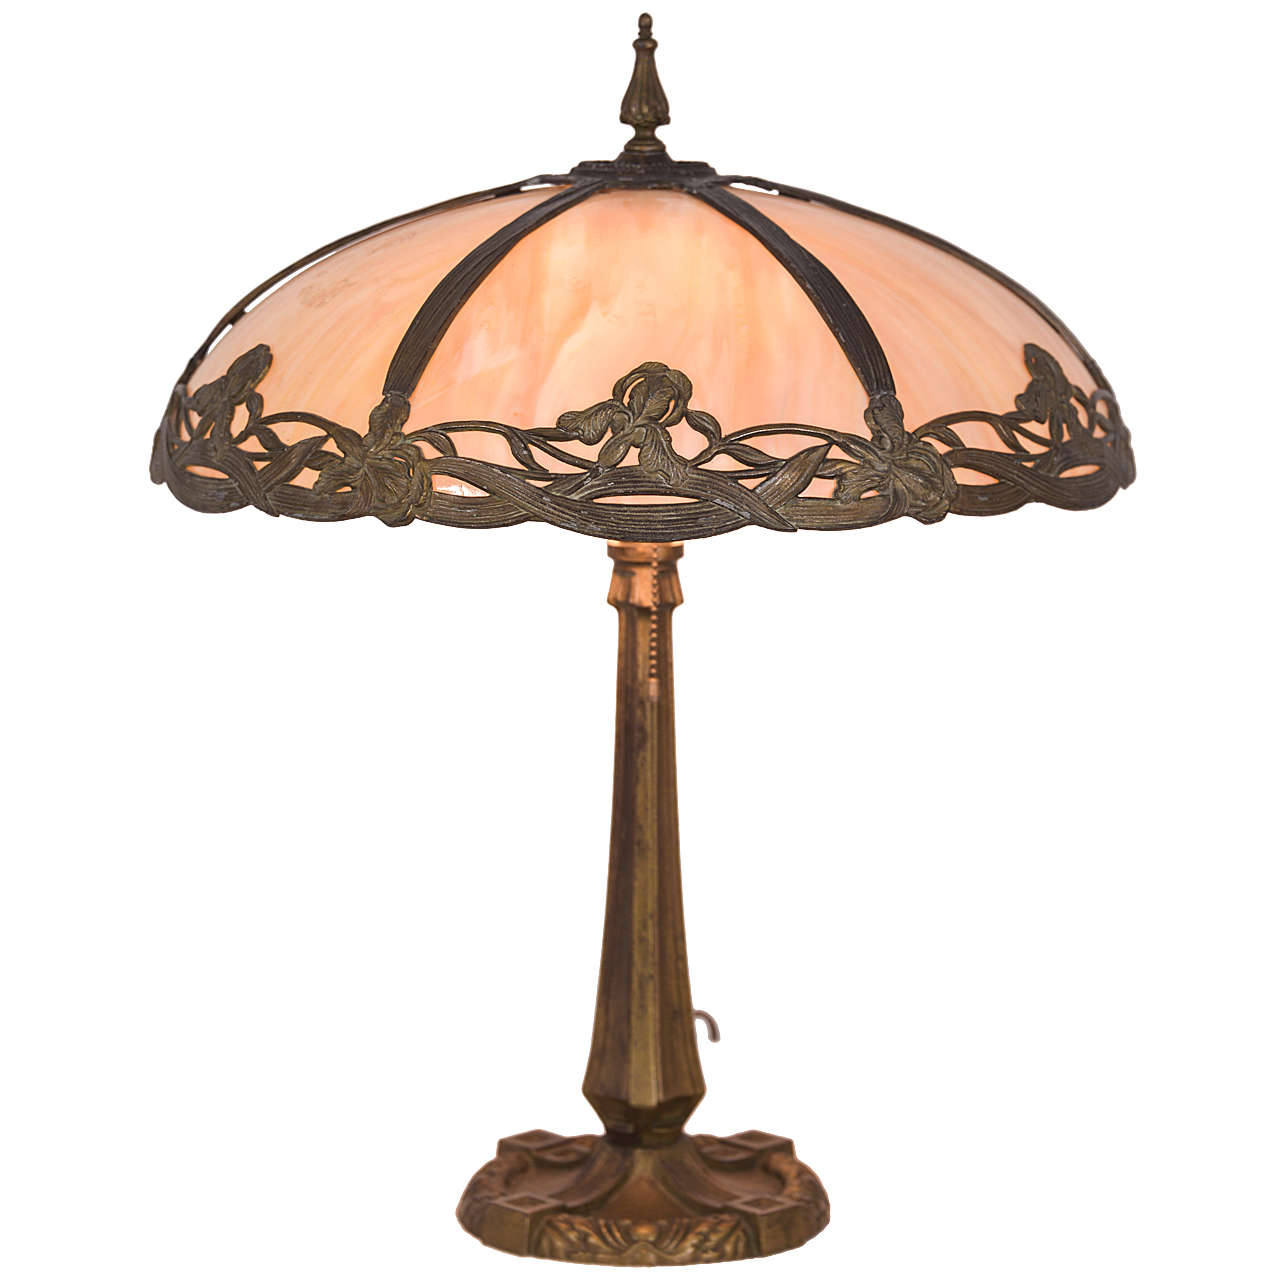 1930s Bent Slag Glass Table Lamp At 1stdibs